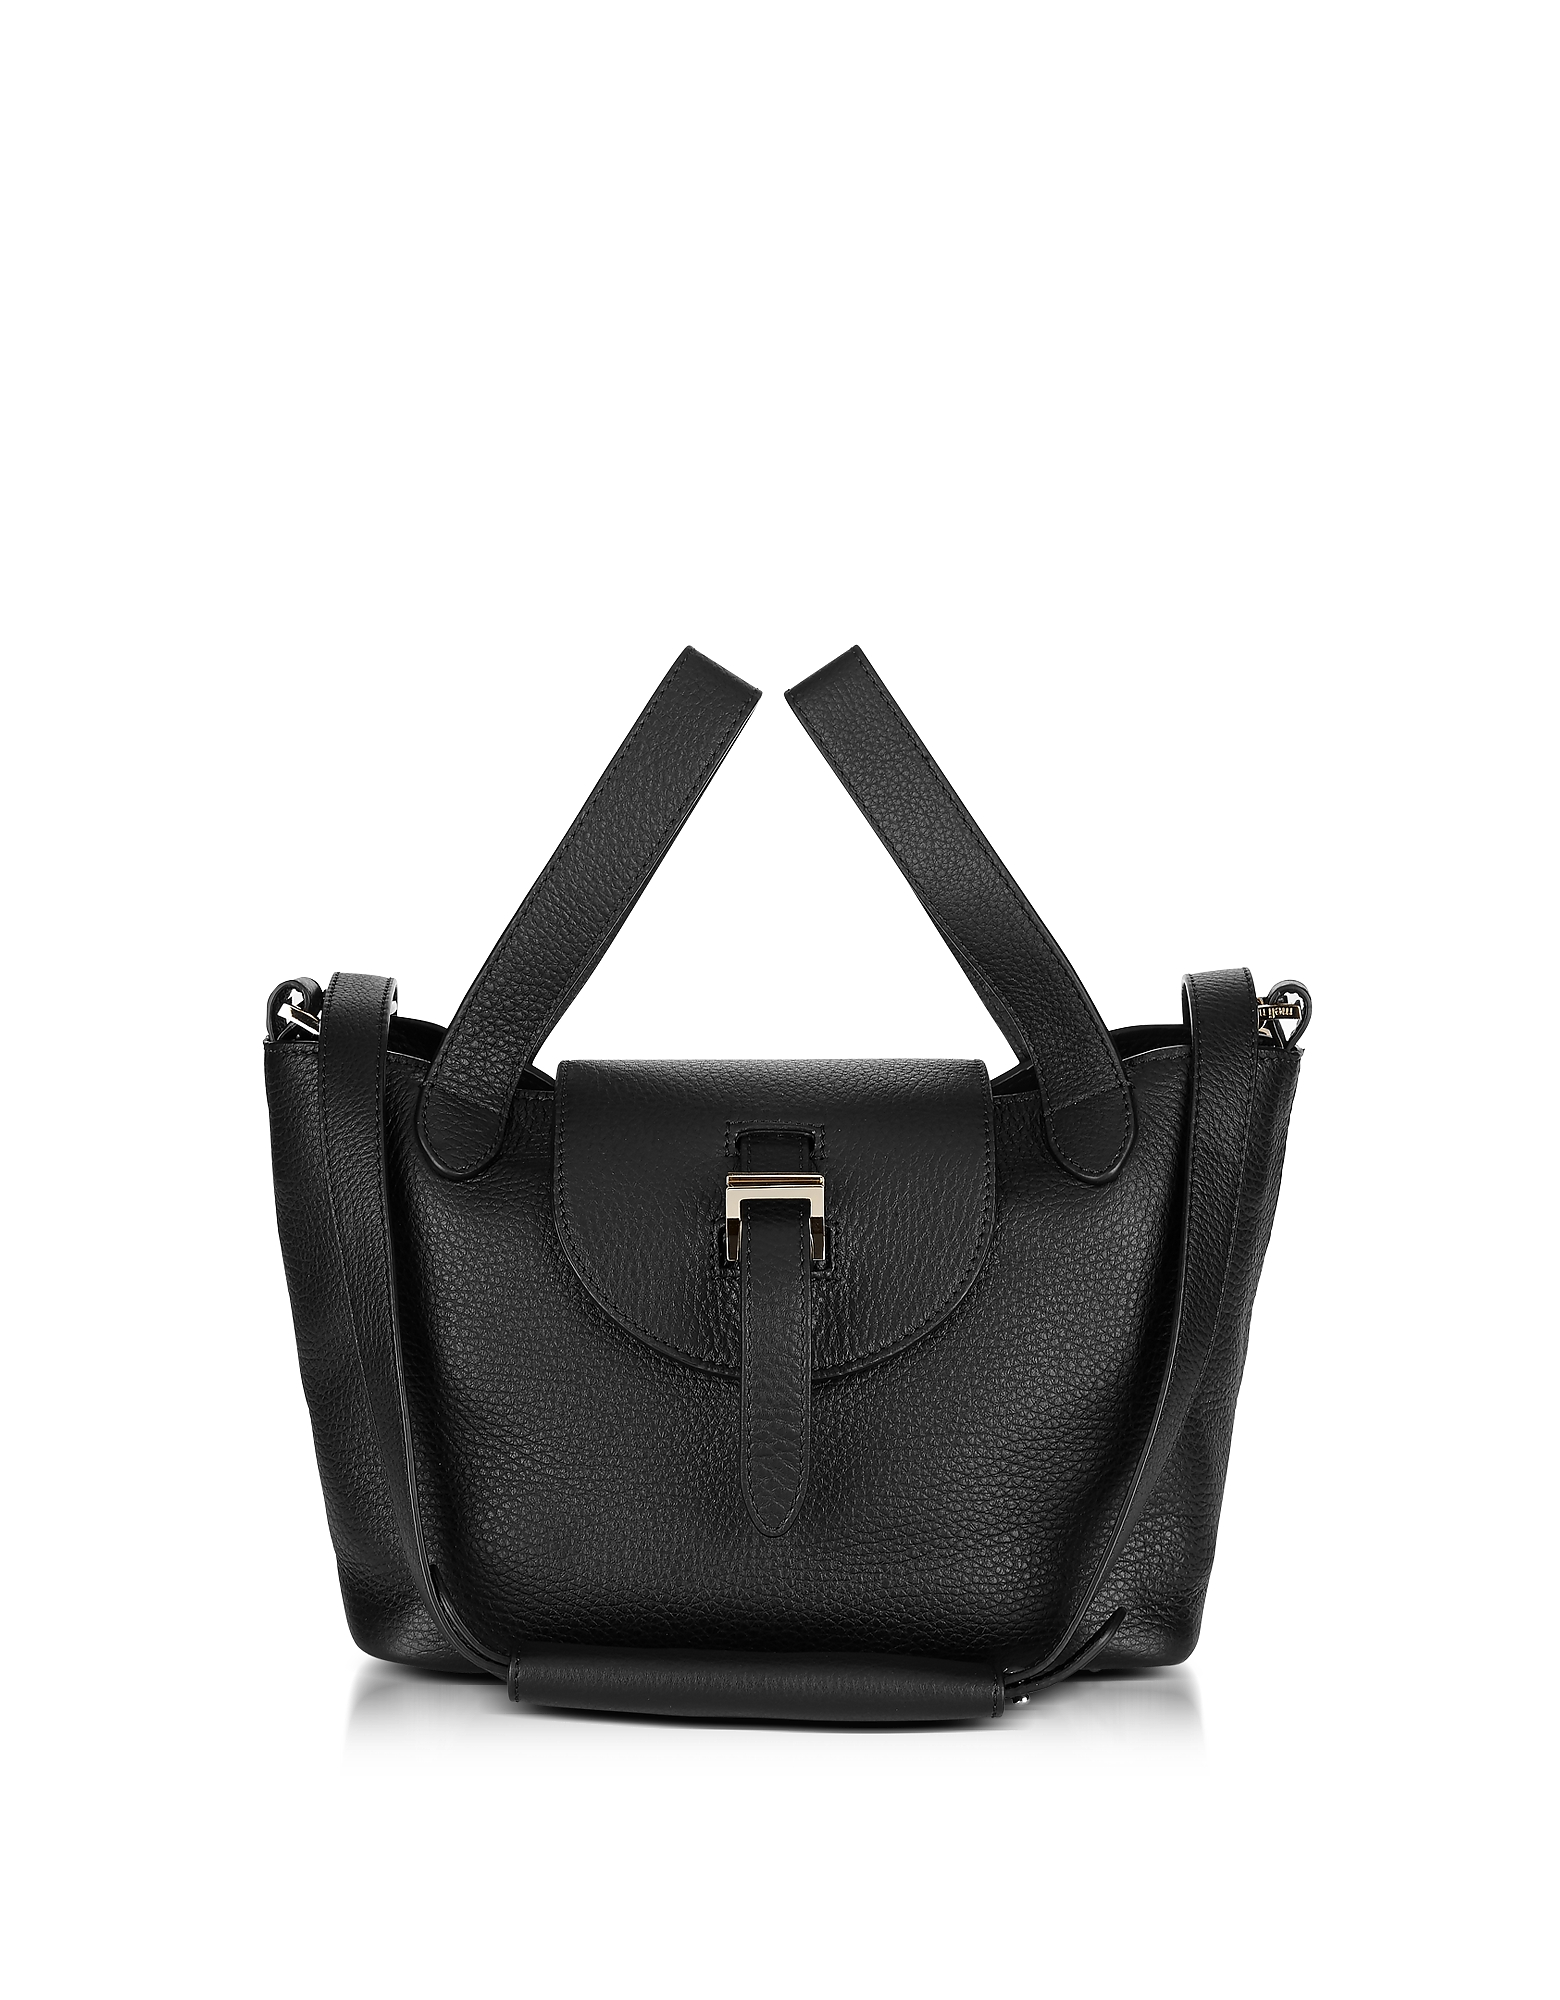 Image of Meli Melo Designer Handbags, Black Thela Mini Cross Body Bag